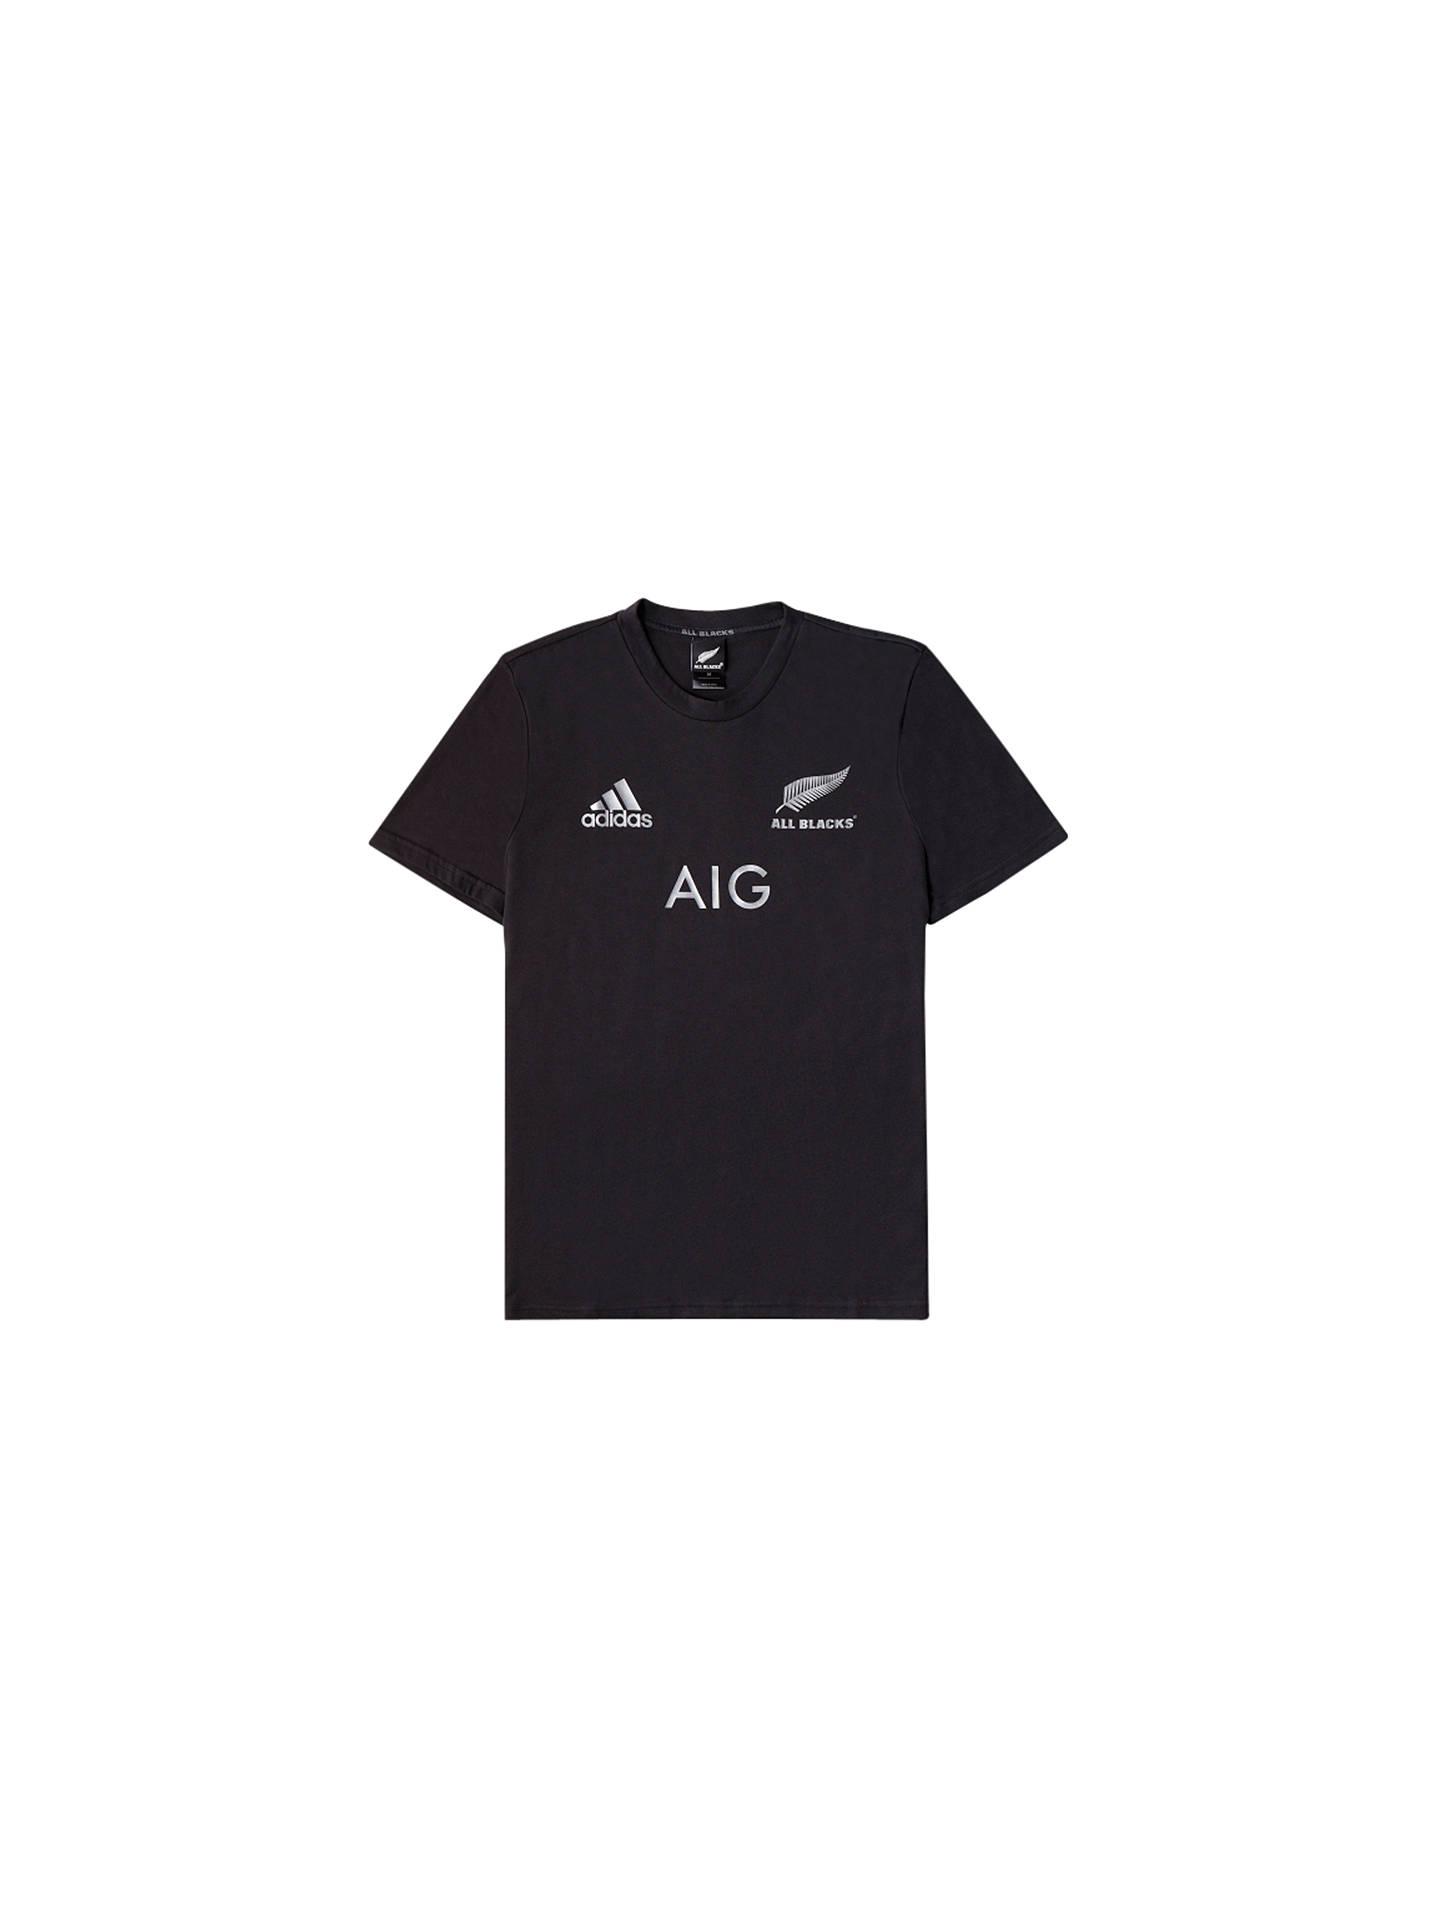 4efee1db Buy Adidas New Zealand All Blacks 2015/16 Players Performance Rugby T-Shirt  ...